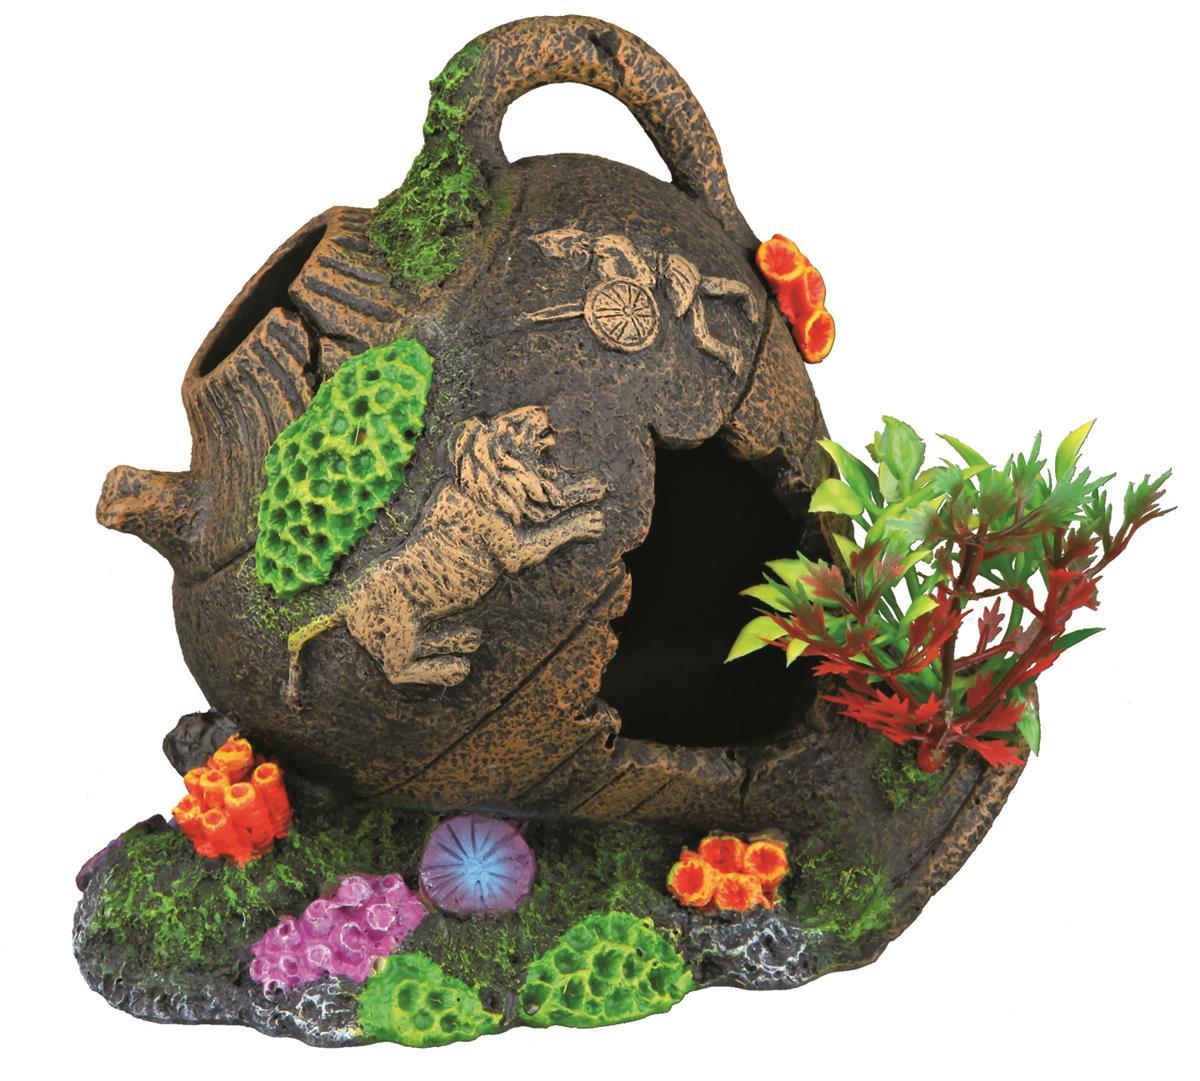 Akvariedekor Amphorae krukke 12 cm